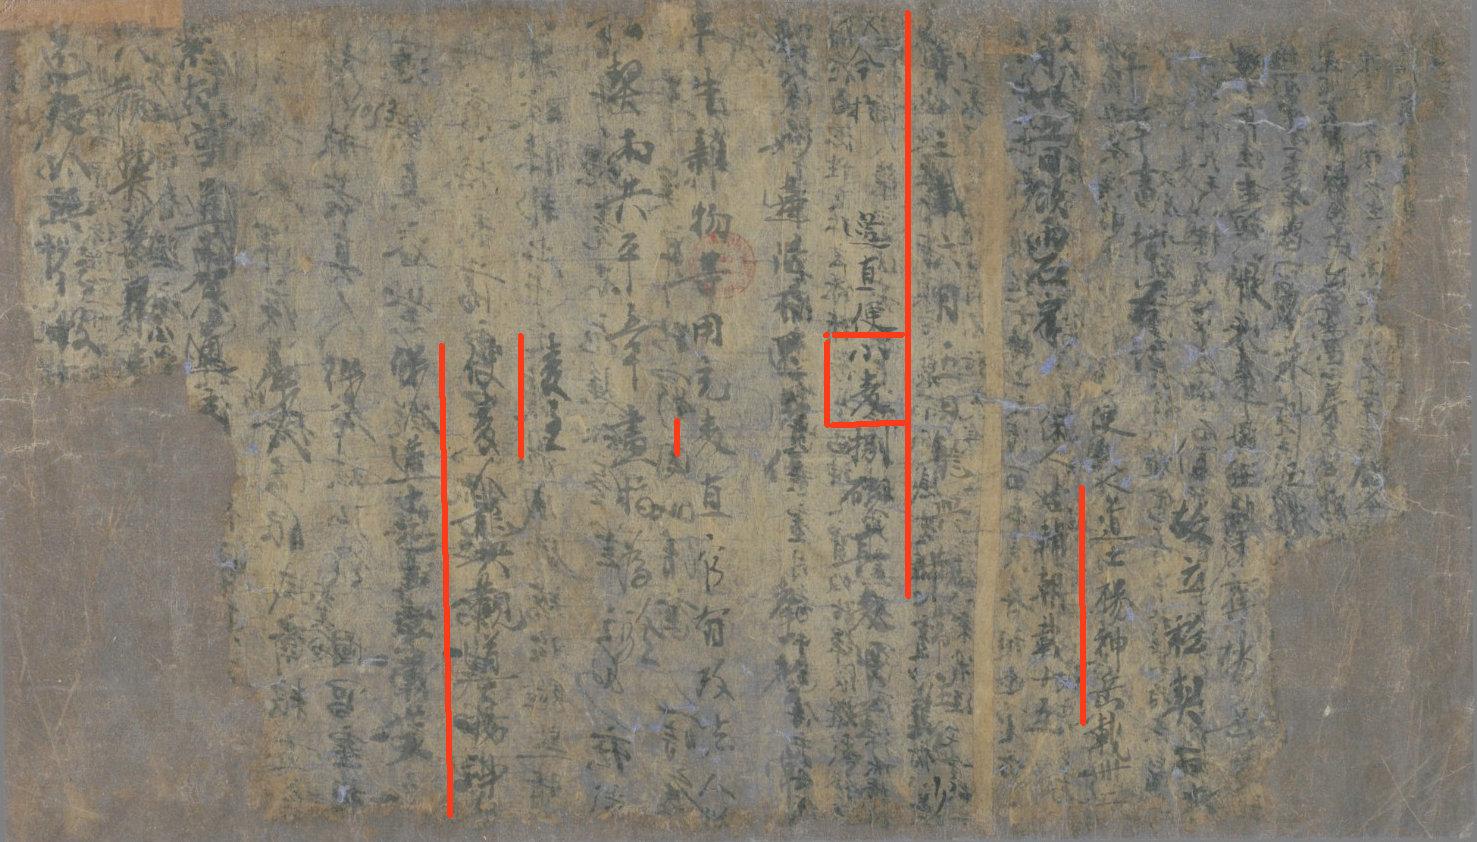 Pelliot_chinois_4053__btv1b83009762.JPEG